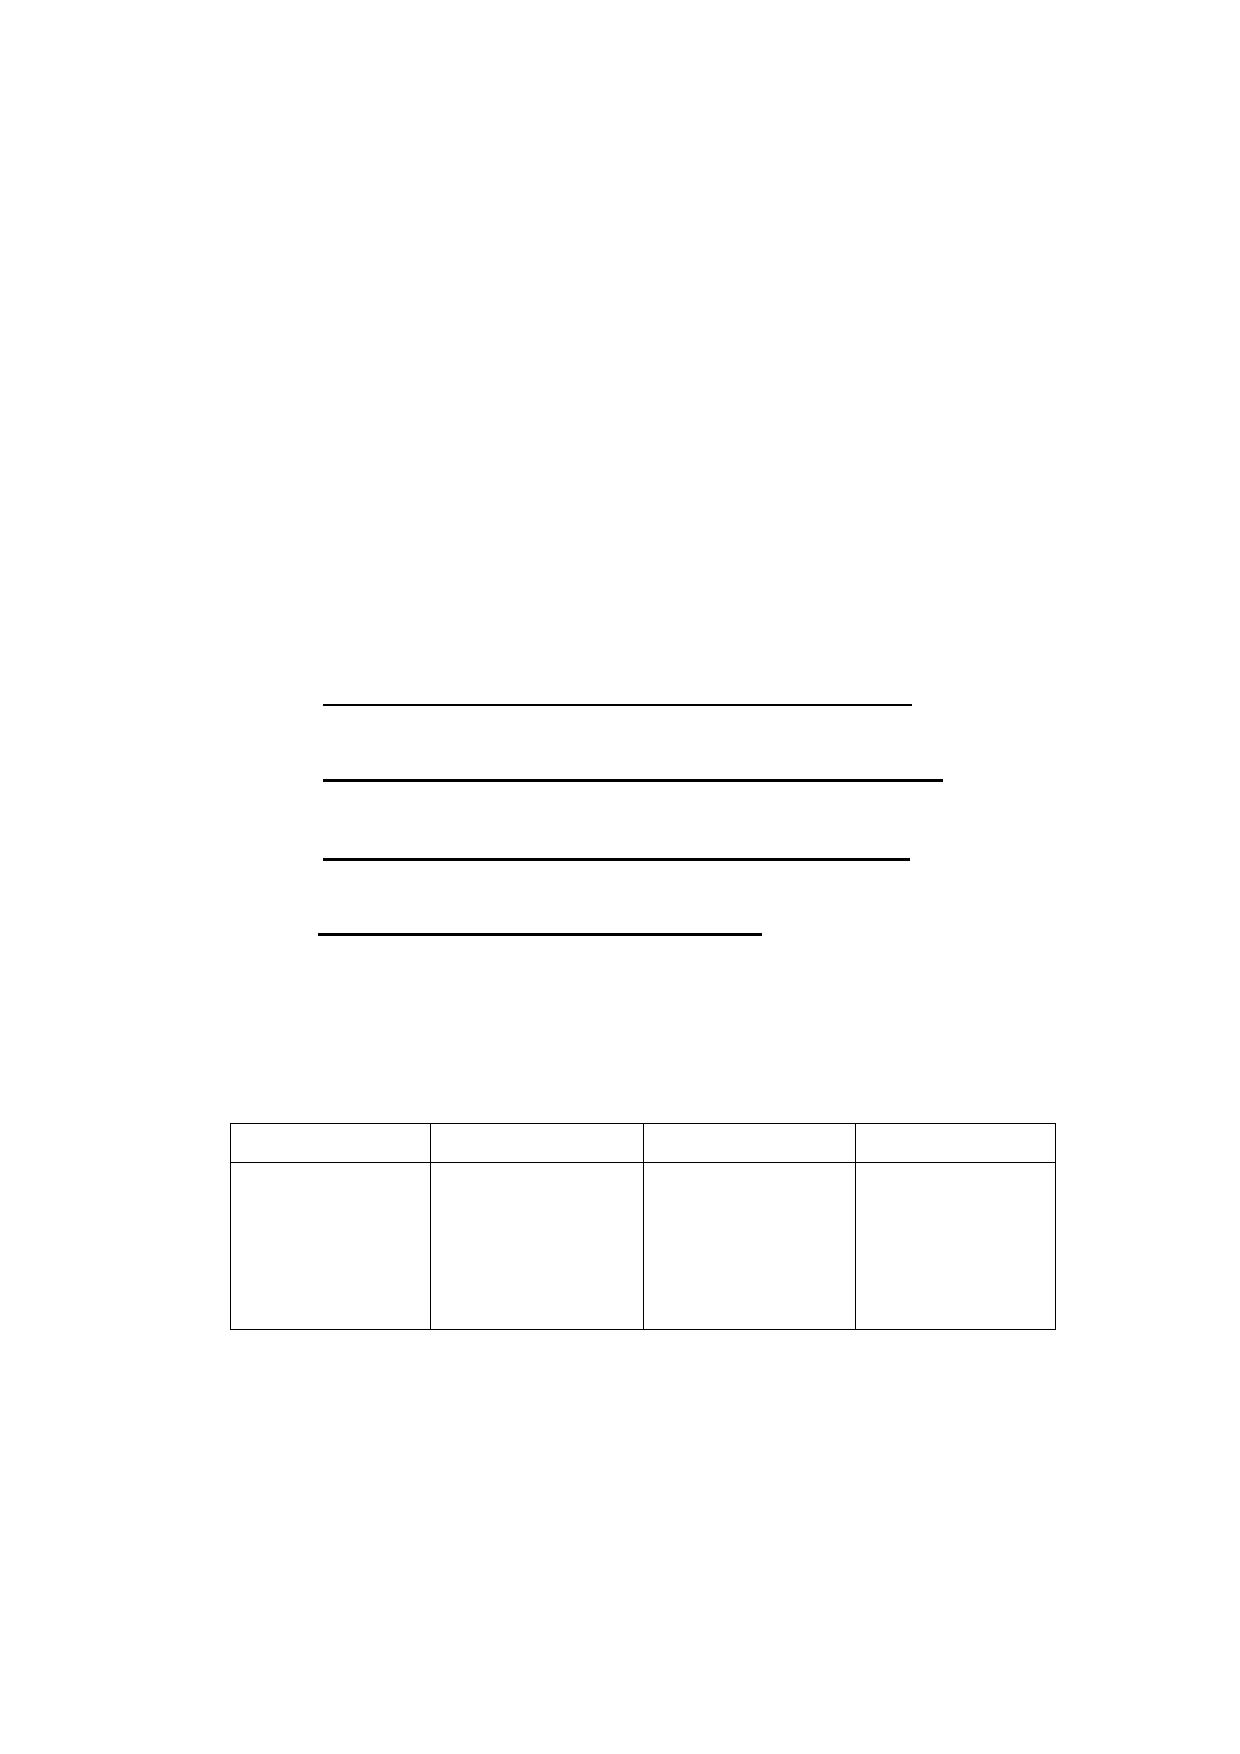 AC1122 دیتاشیت PDF